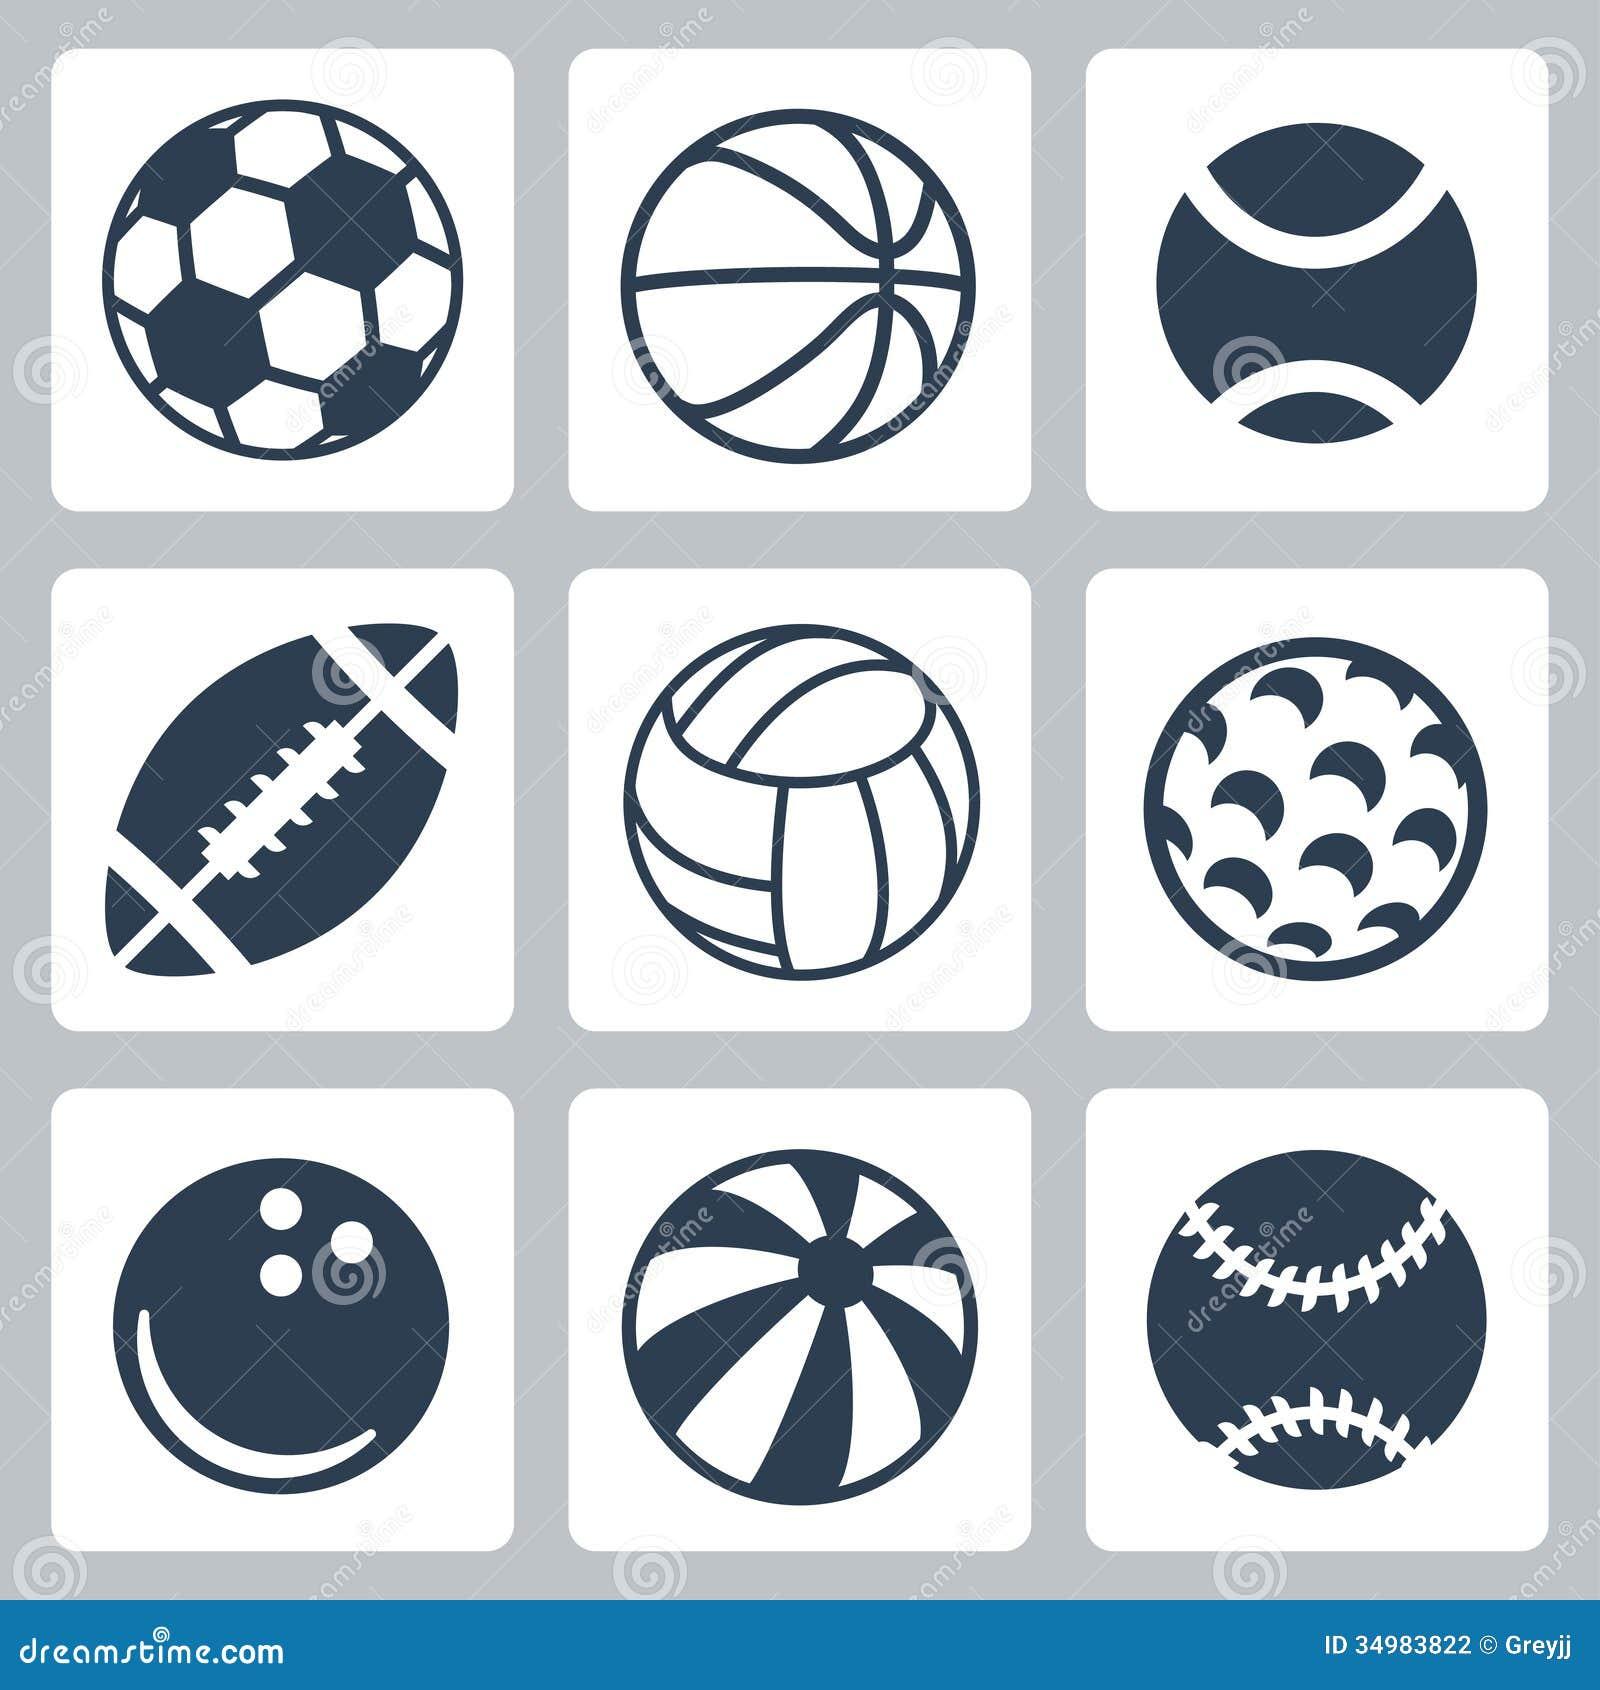 Sports Balls Button Set Stock Illustrations 106 Sports Balls Button Set Stock Illustrations Vectors Clipart Dreamstime